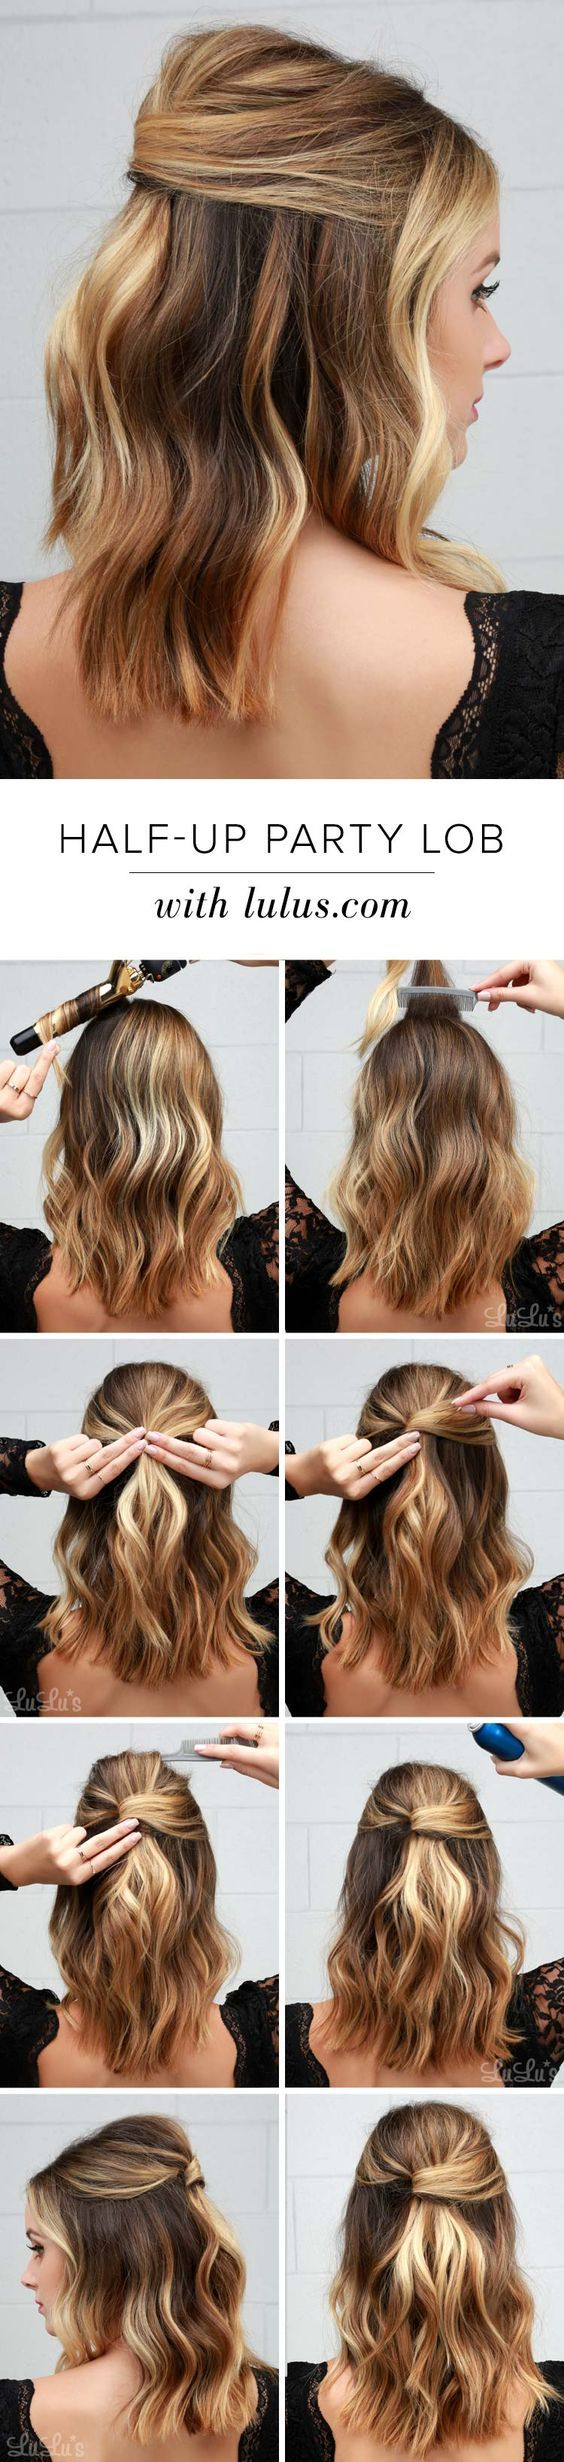 Terrific 1000 Ideas About Diy Hairstyles On Pinterest Easy Diy Hairstyles For Women Draintrainus